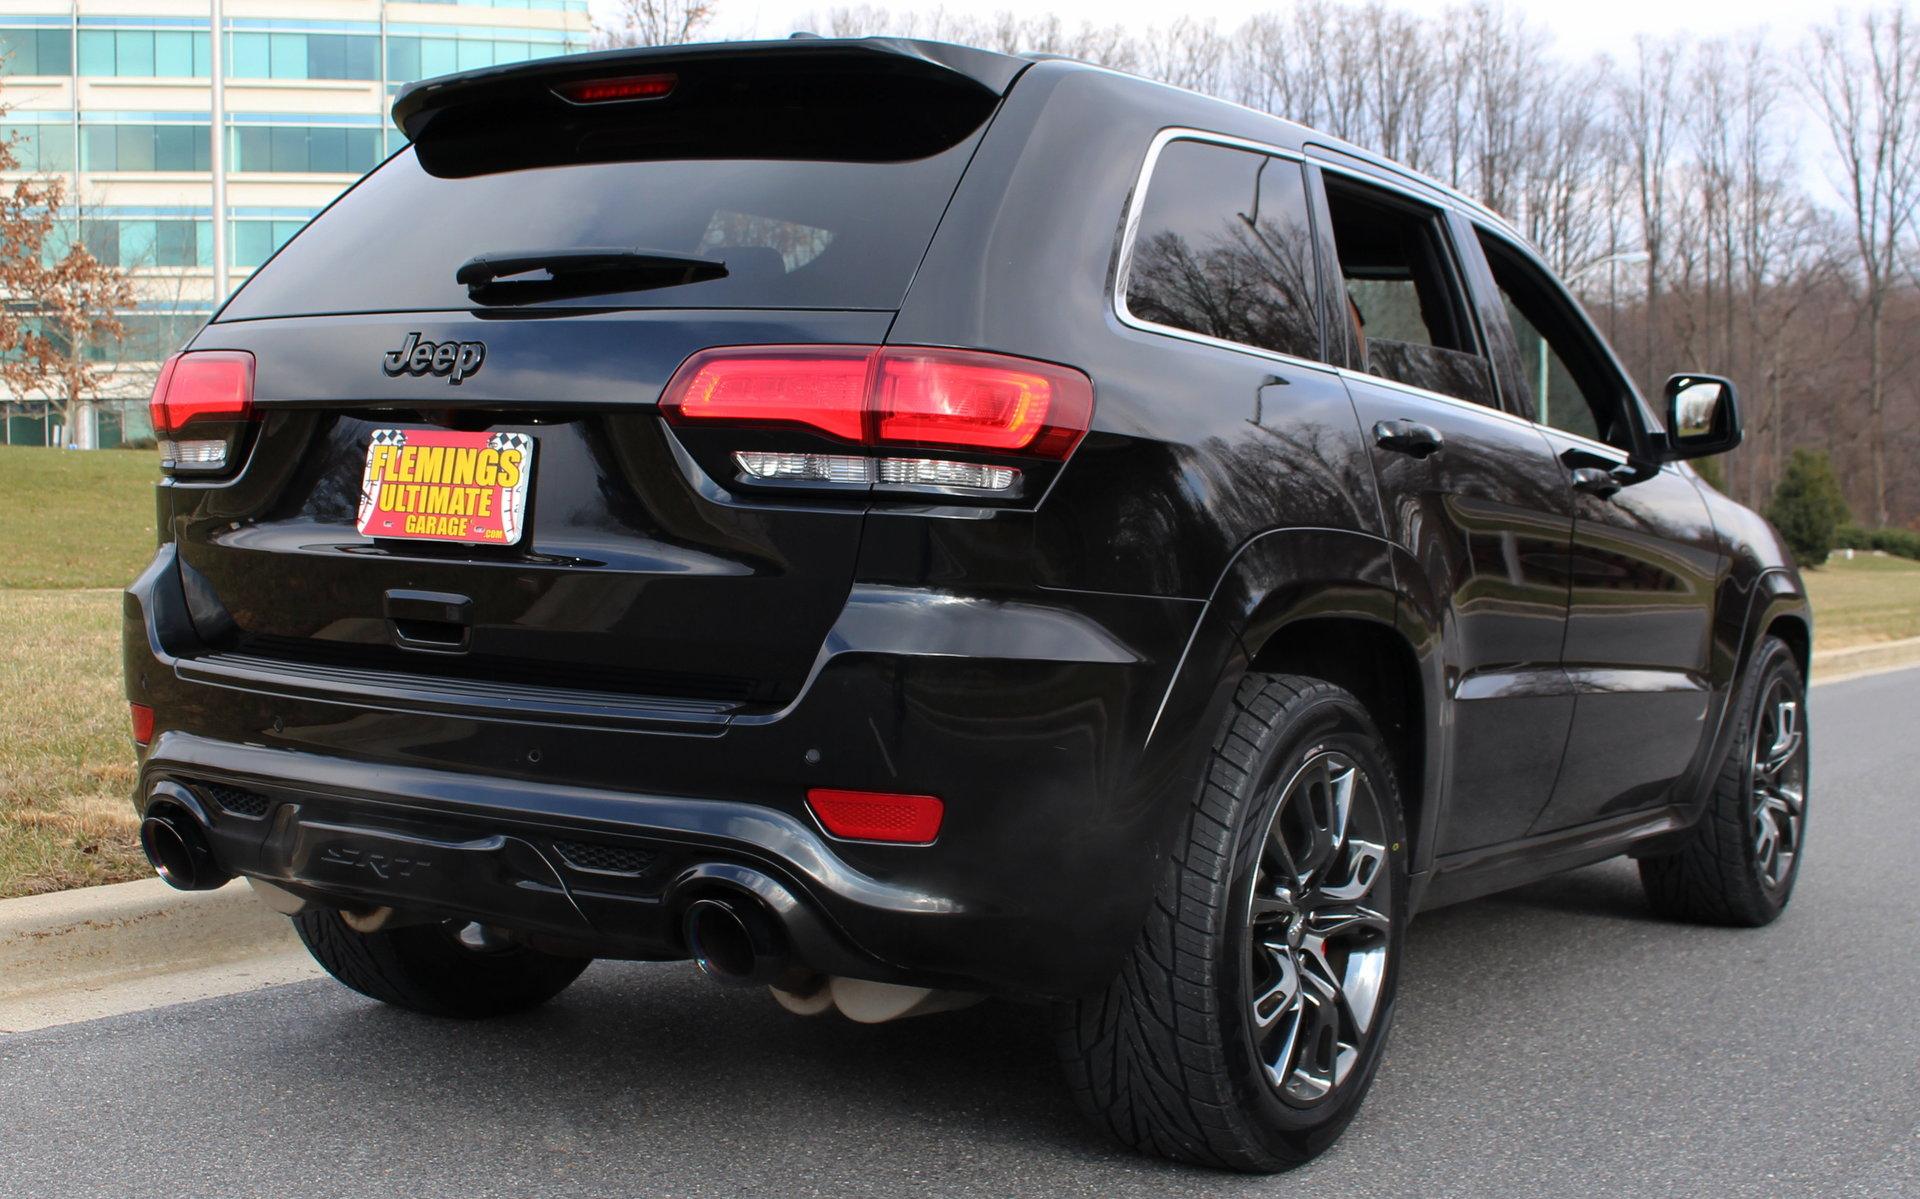 jeep cherokee grand srt srt8 specs rockville maryland options vehicles air cars